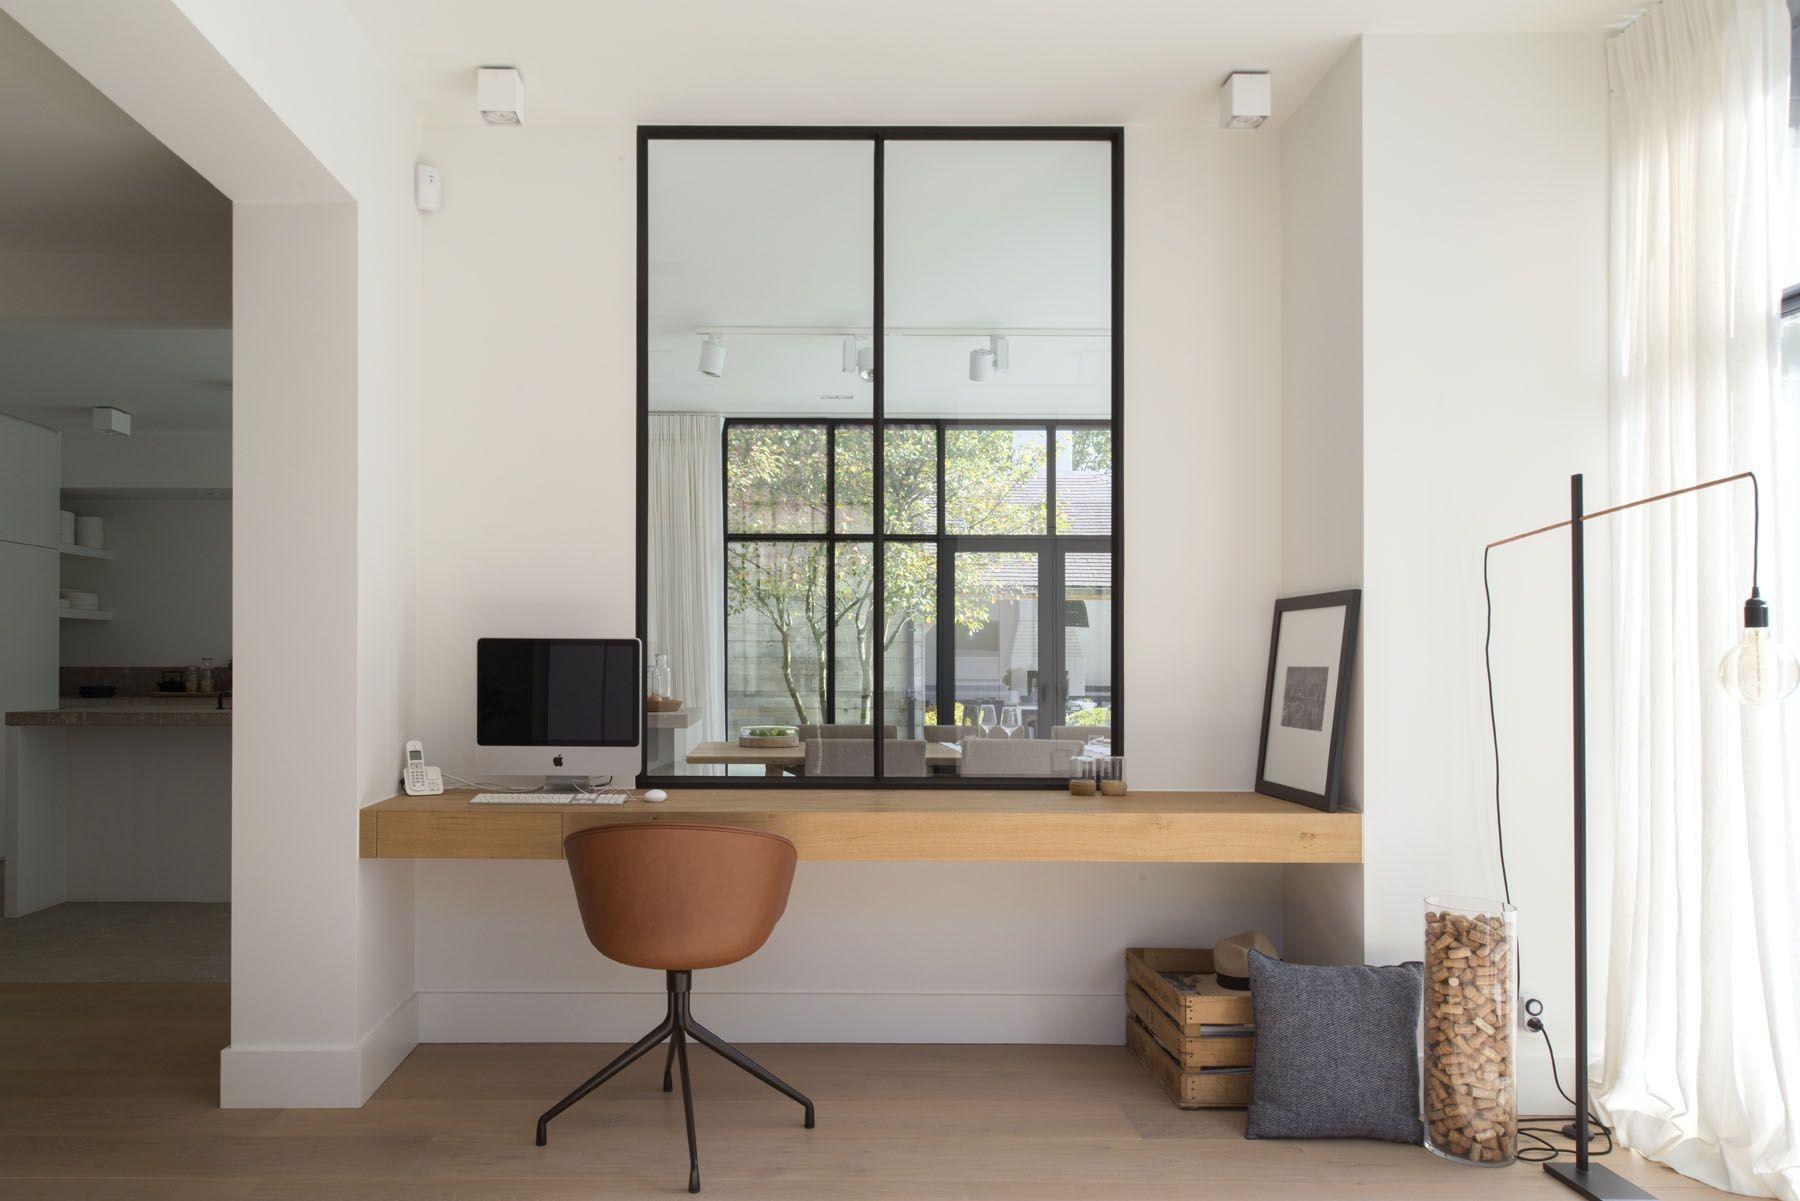 8x Minimalistische Werkplek : Renovatie oscar v nieuw thuis werkplek compact